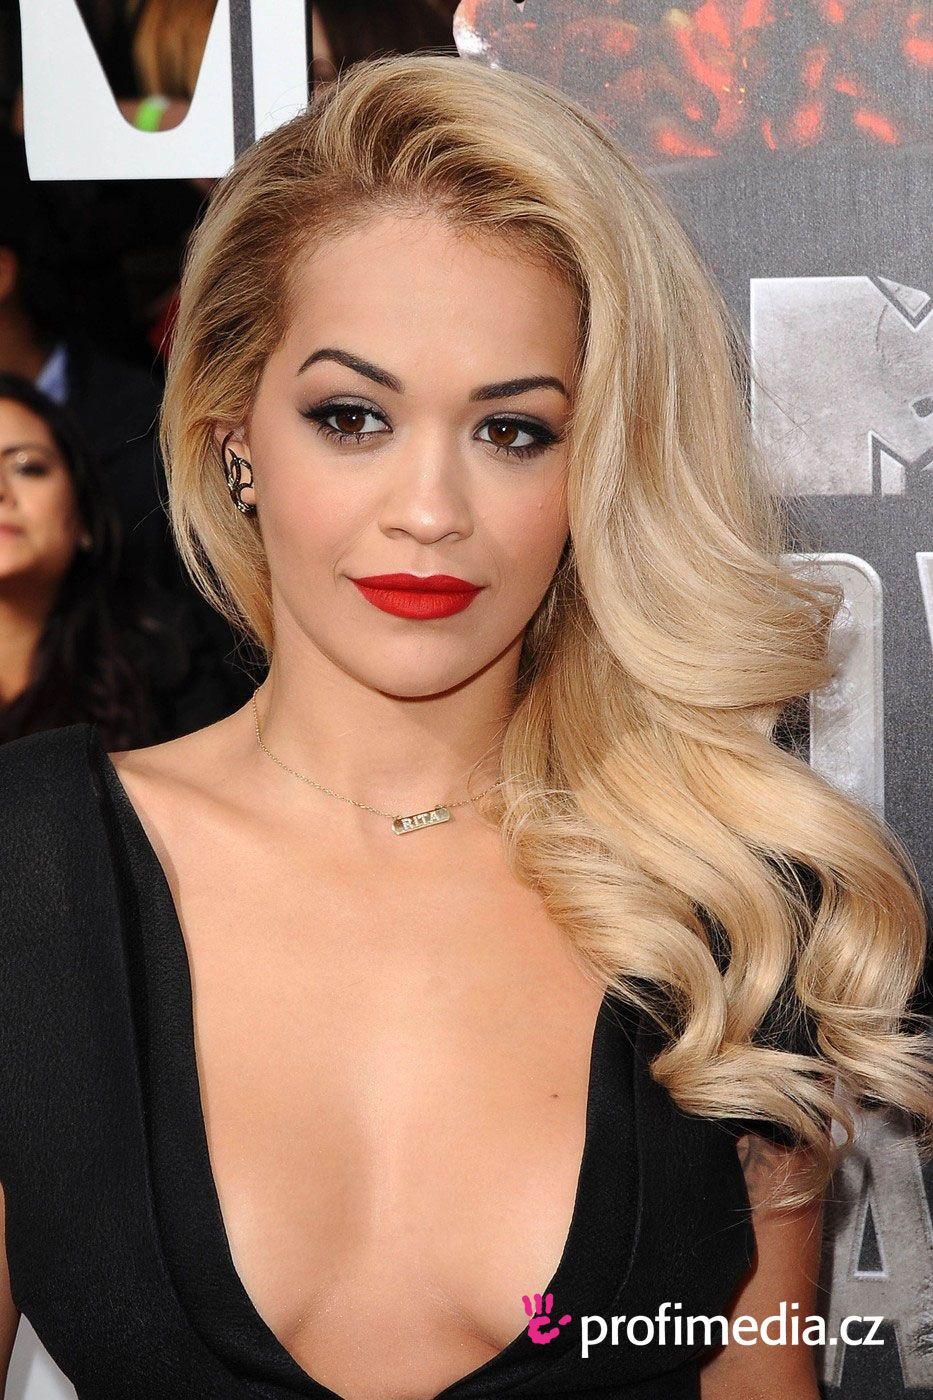 Rita Ora Hairstyle Easyhairstyler Glamour Hair Cool Blonde Hair Hollywood Curls